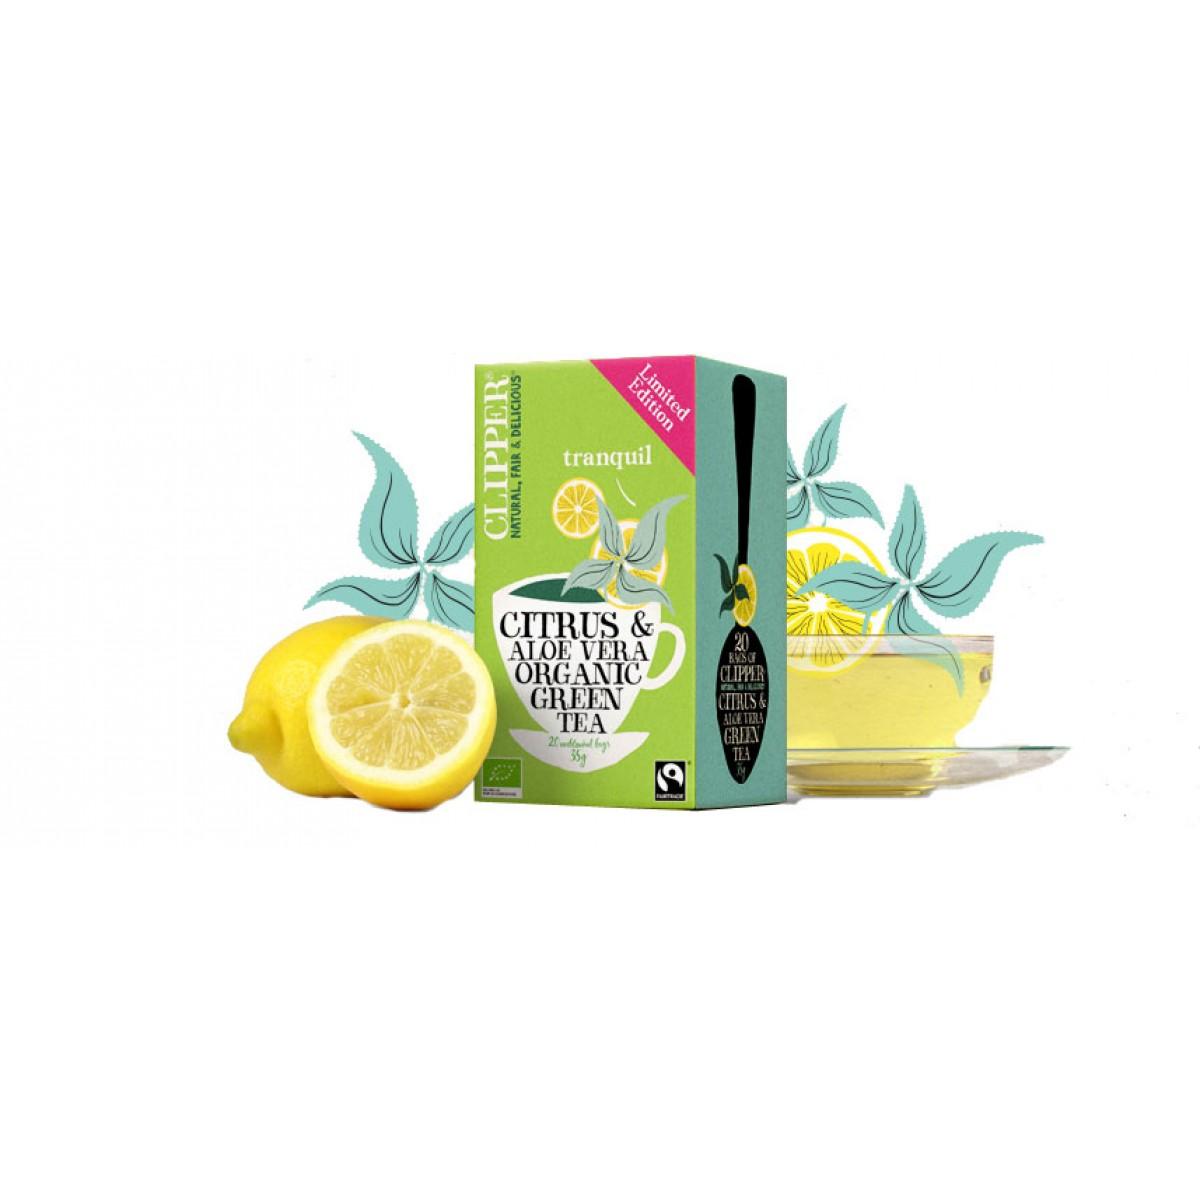 Green Citrus & Aloë Vera